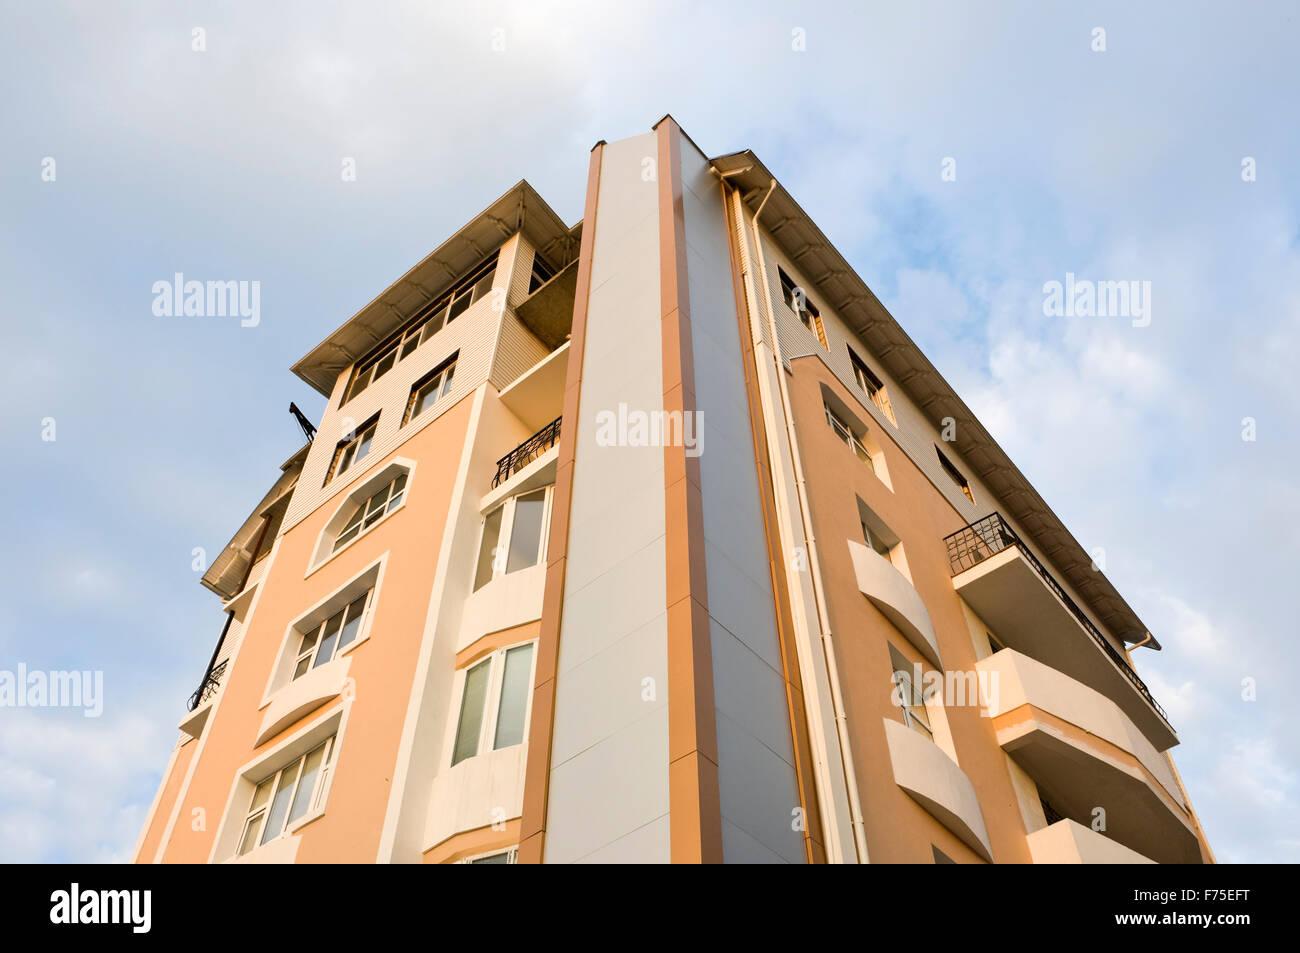 residental building - Stock Image